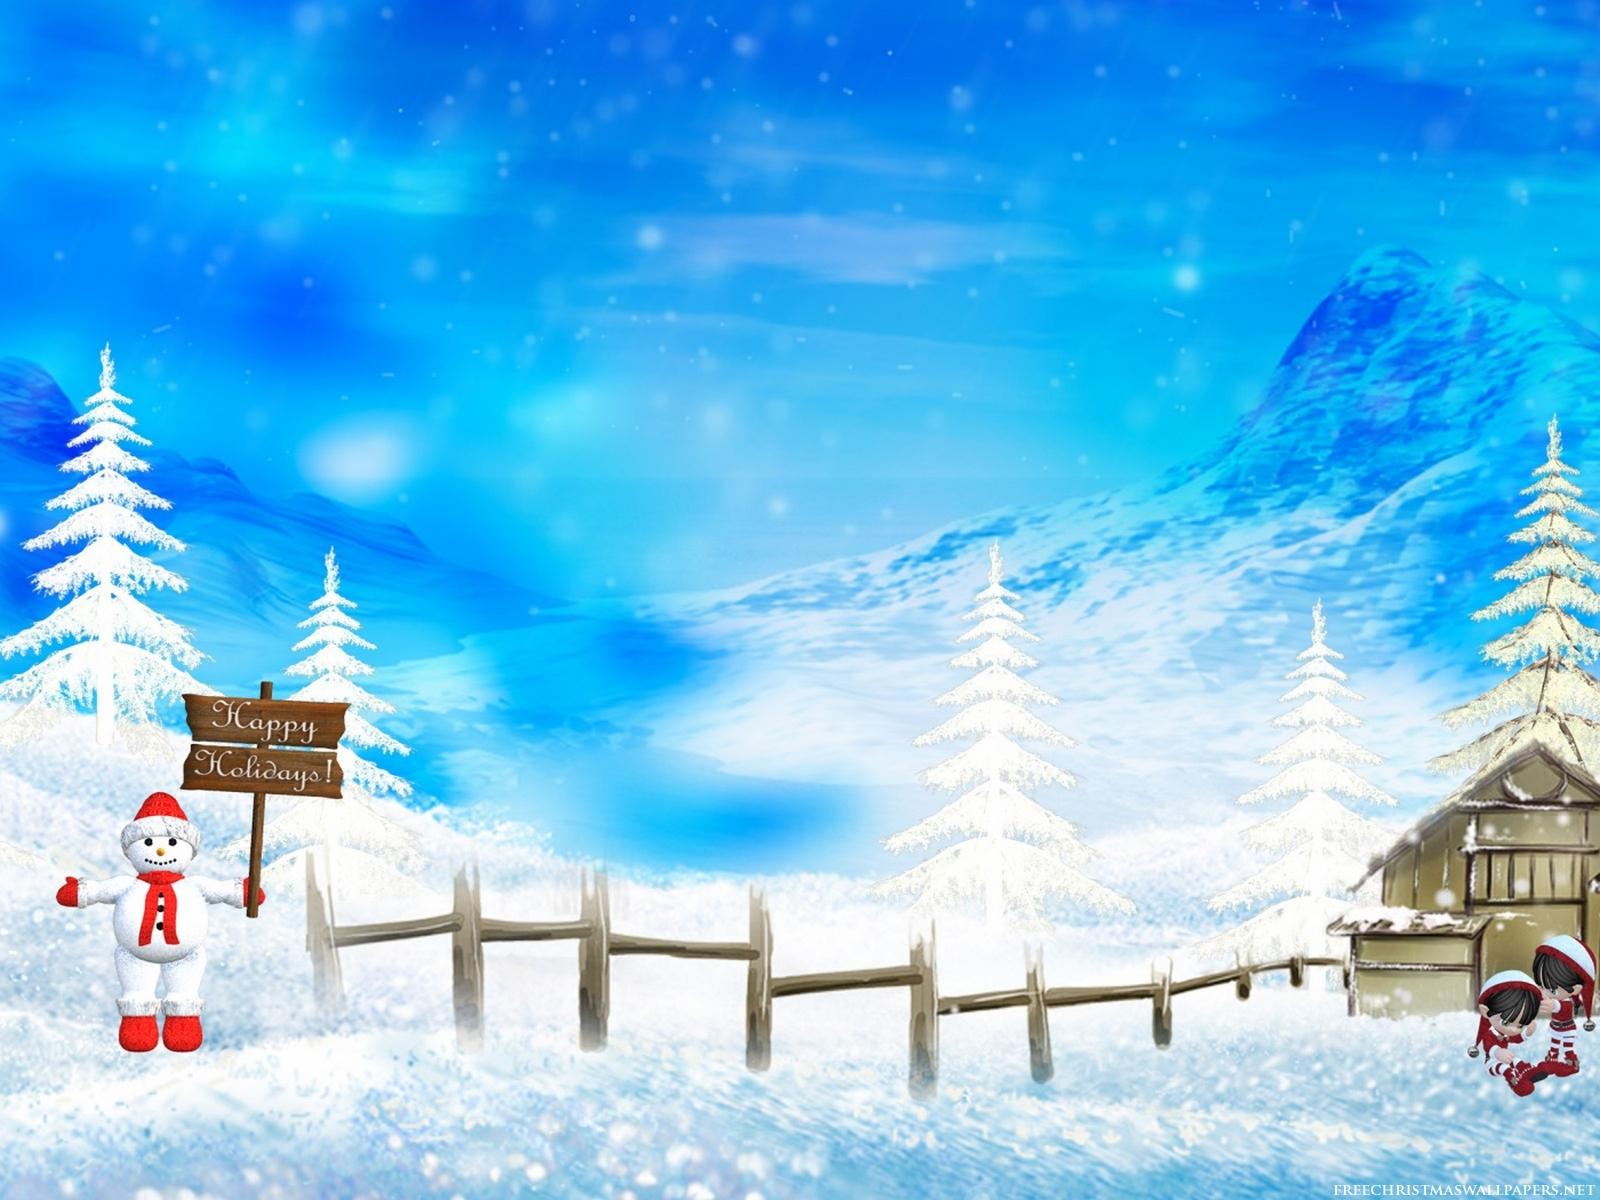 http://4.bp.blogspot.com/-lwEin-sPS_c/ToIsjEsz-fI/AAAAAAAAERA/Y_OO4y5sAkc/s1600/Happy-Holidays+wallpapers.jpeg